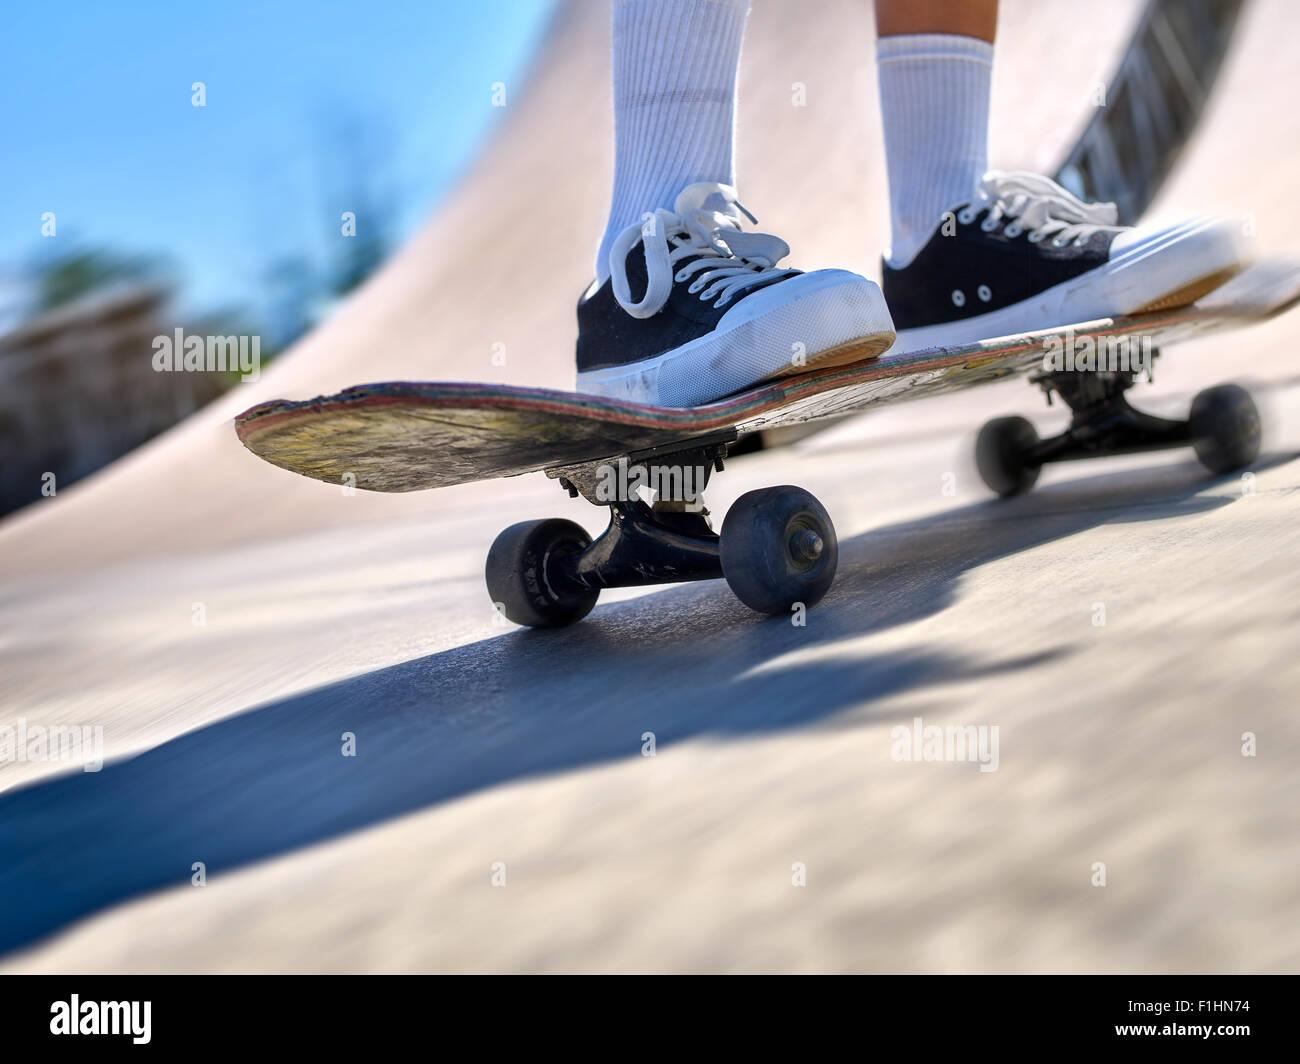 Skateboard jambes close up en skate park. La section basse. Photo Stock